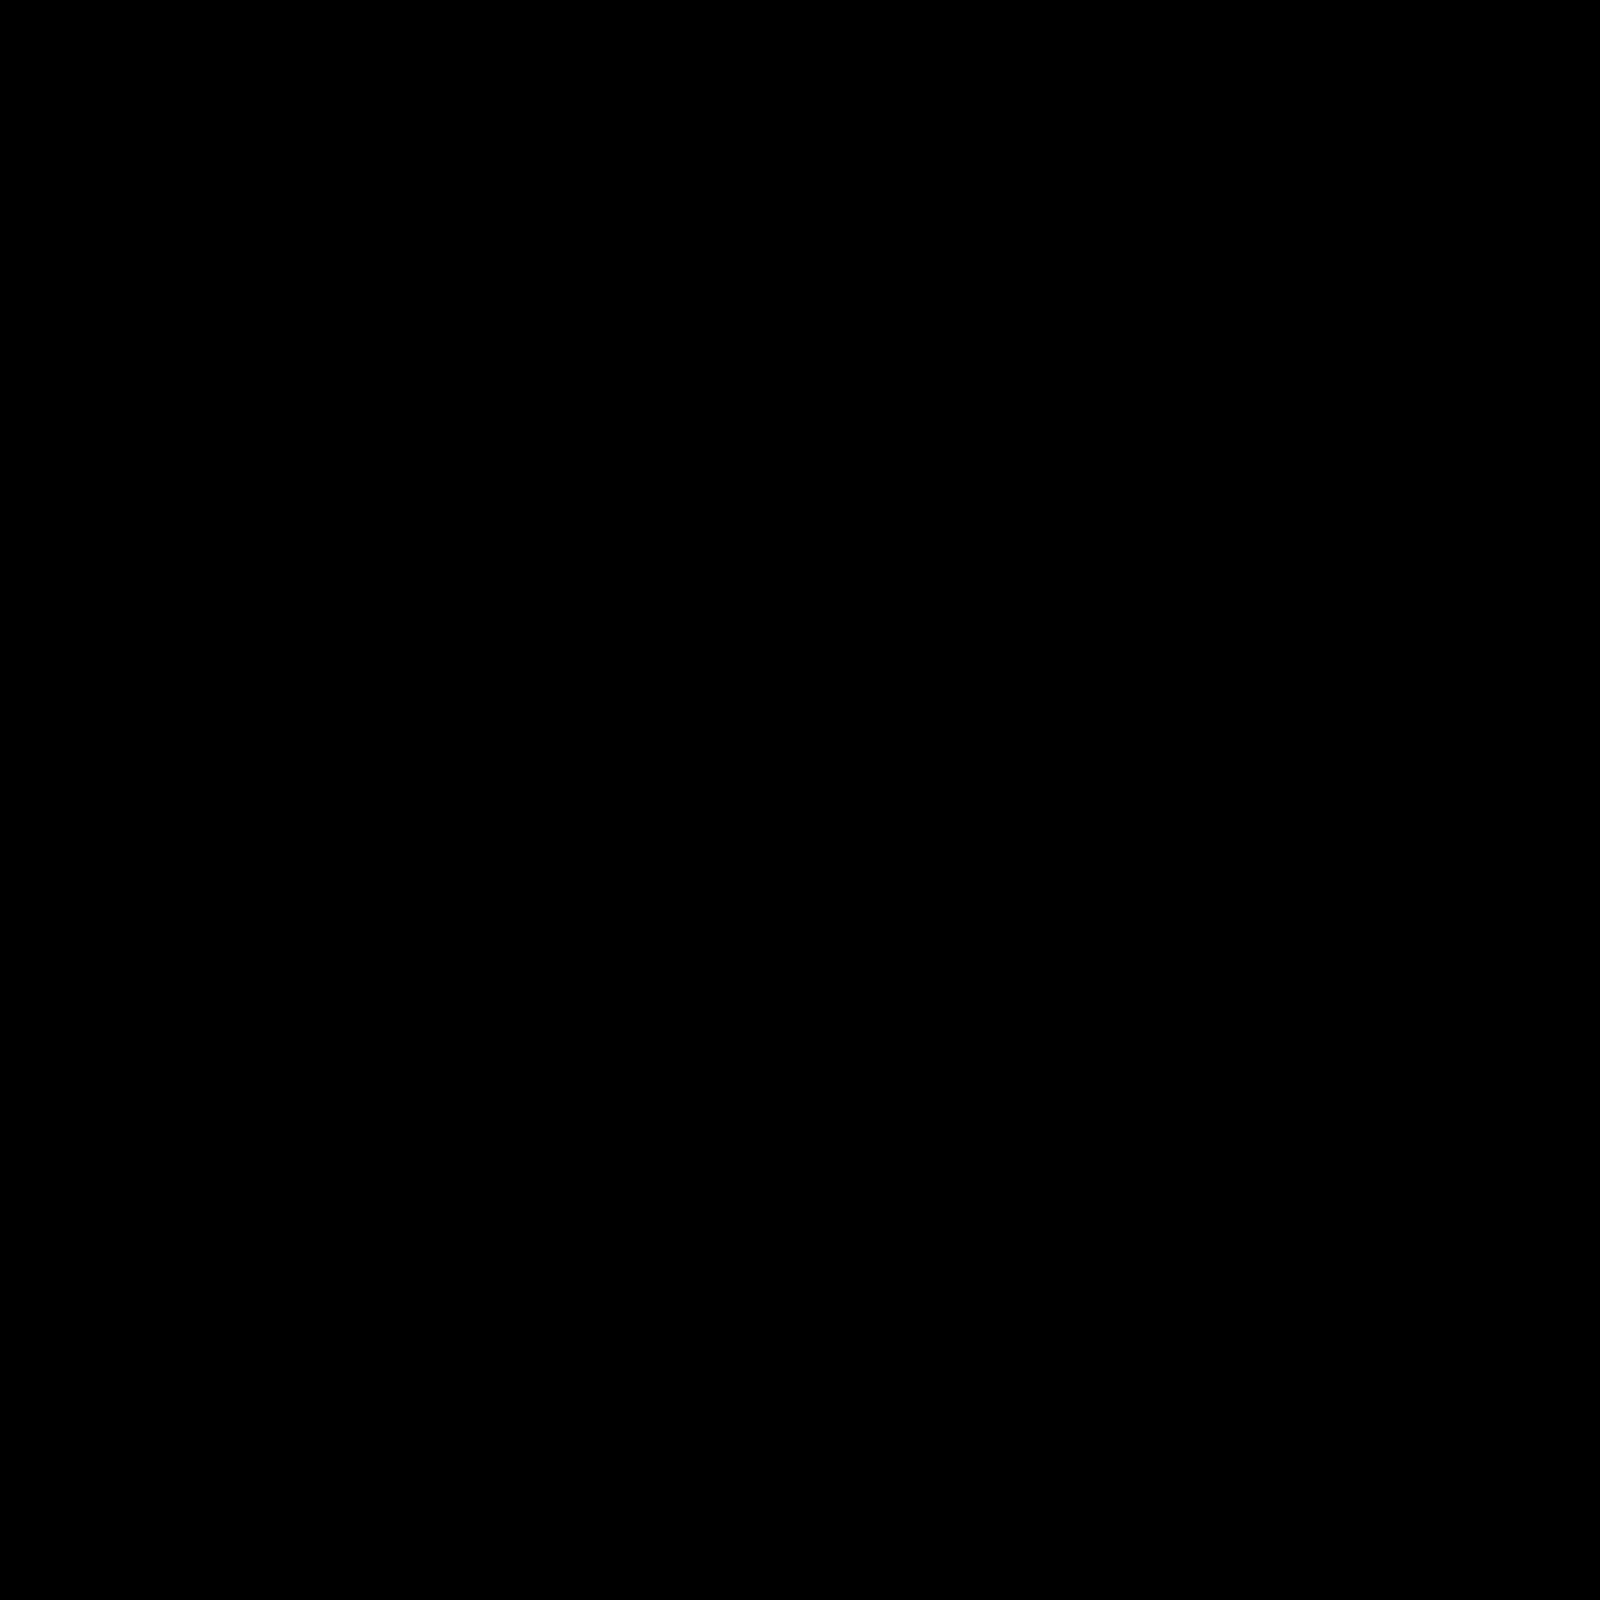 Wooden Floor icon